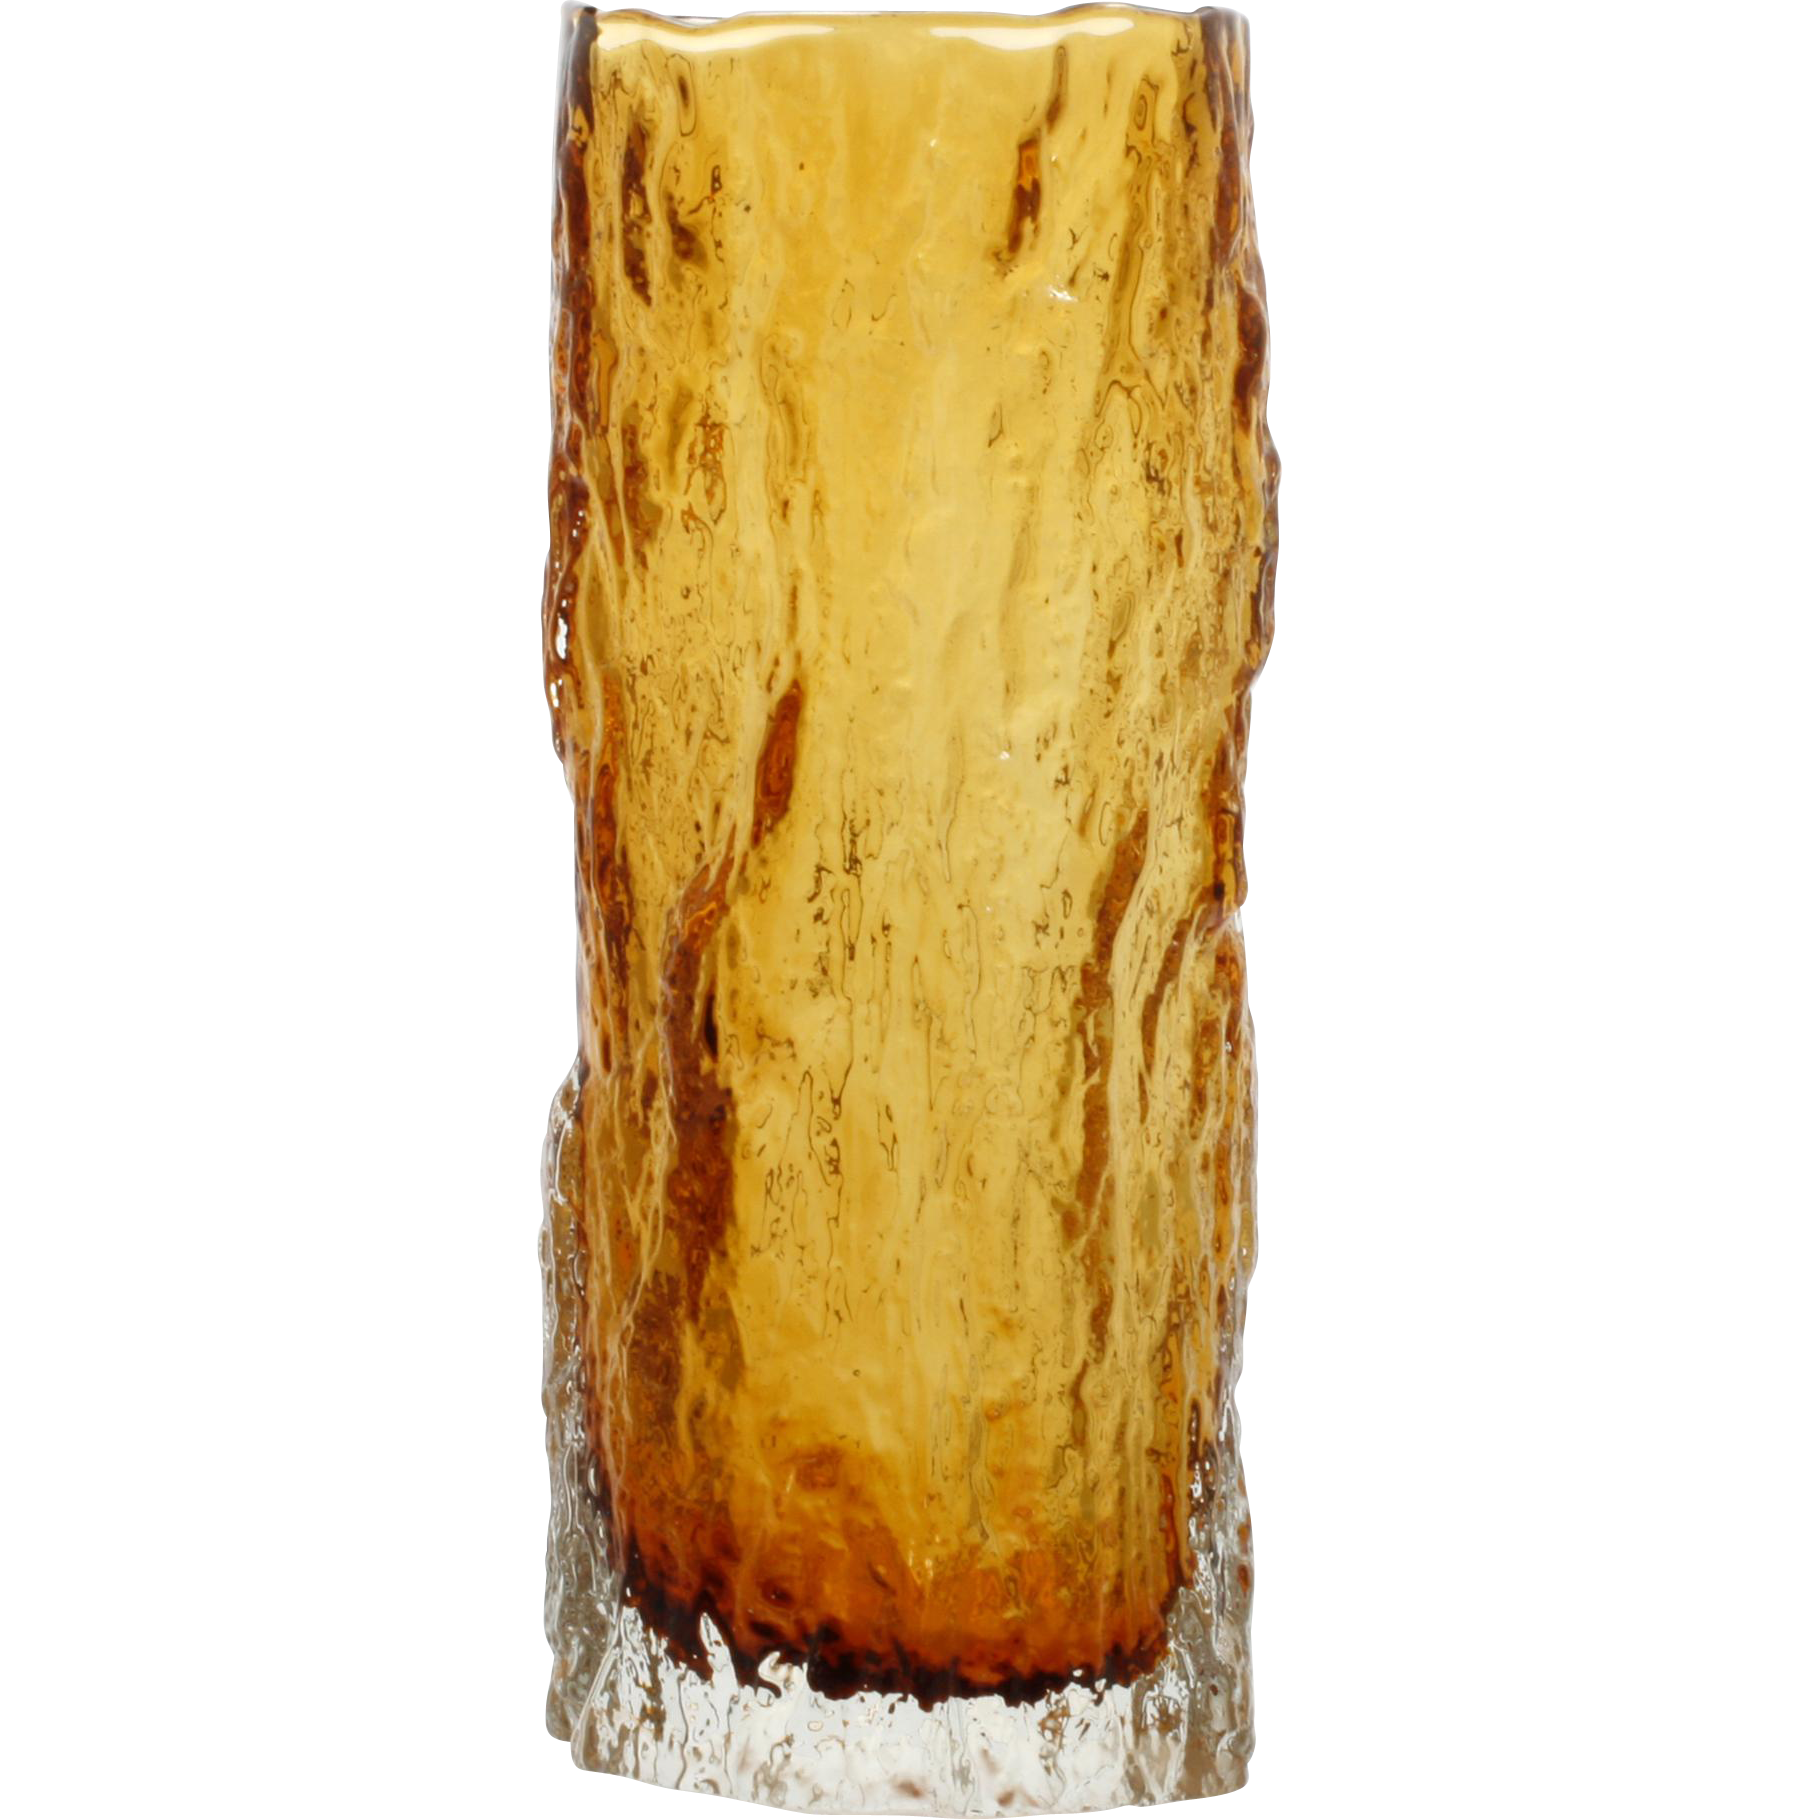 vintage amber bark art glass vase textured cased glass mid century  - vintage amber bark art glass vase textured cased glass mid century modern